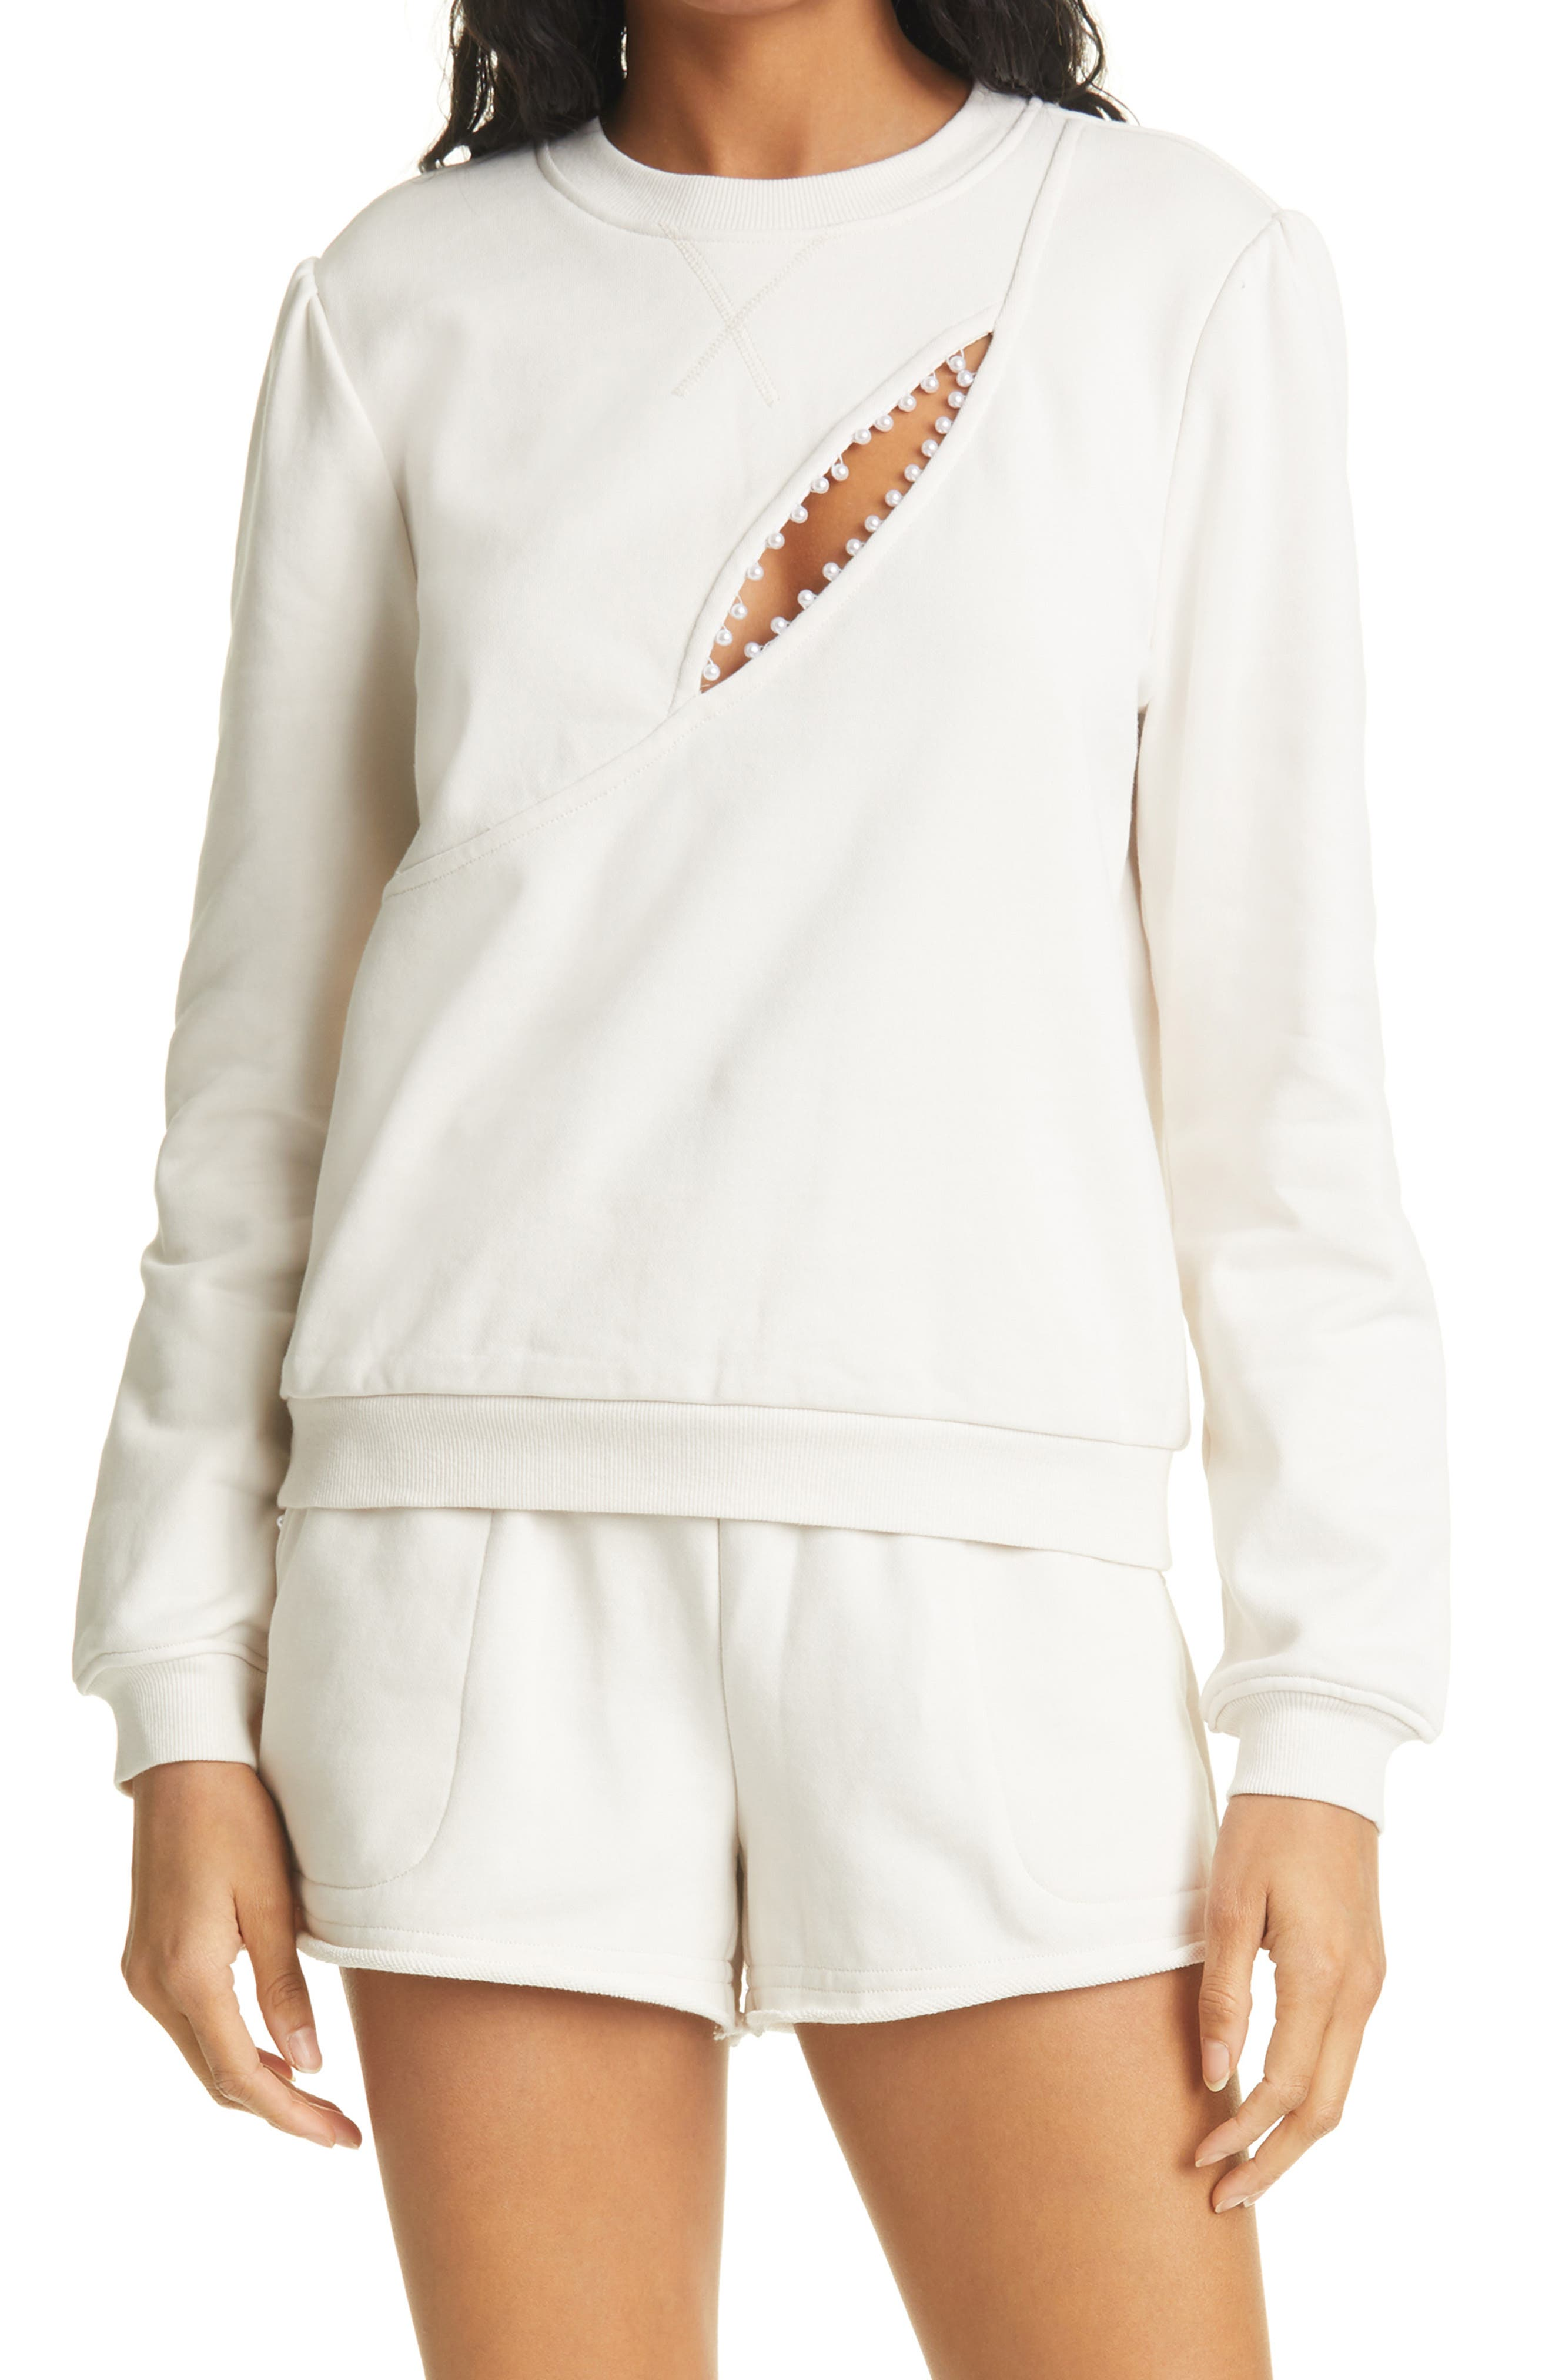 Haru Pearl Trim Cutout Sweatshirt